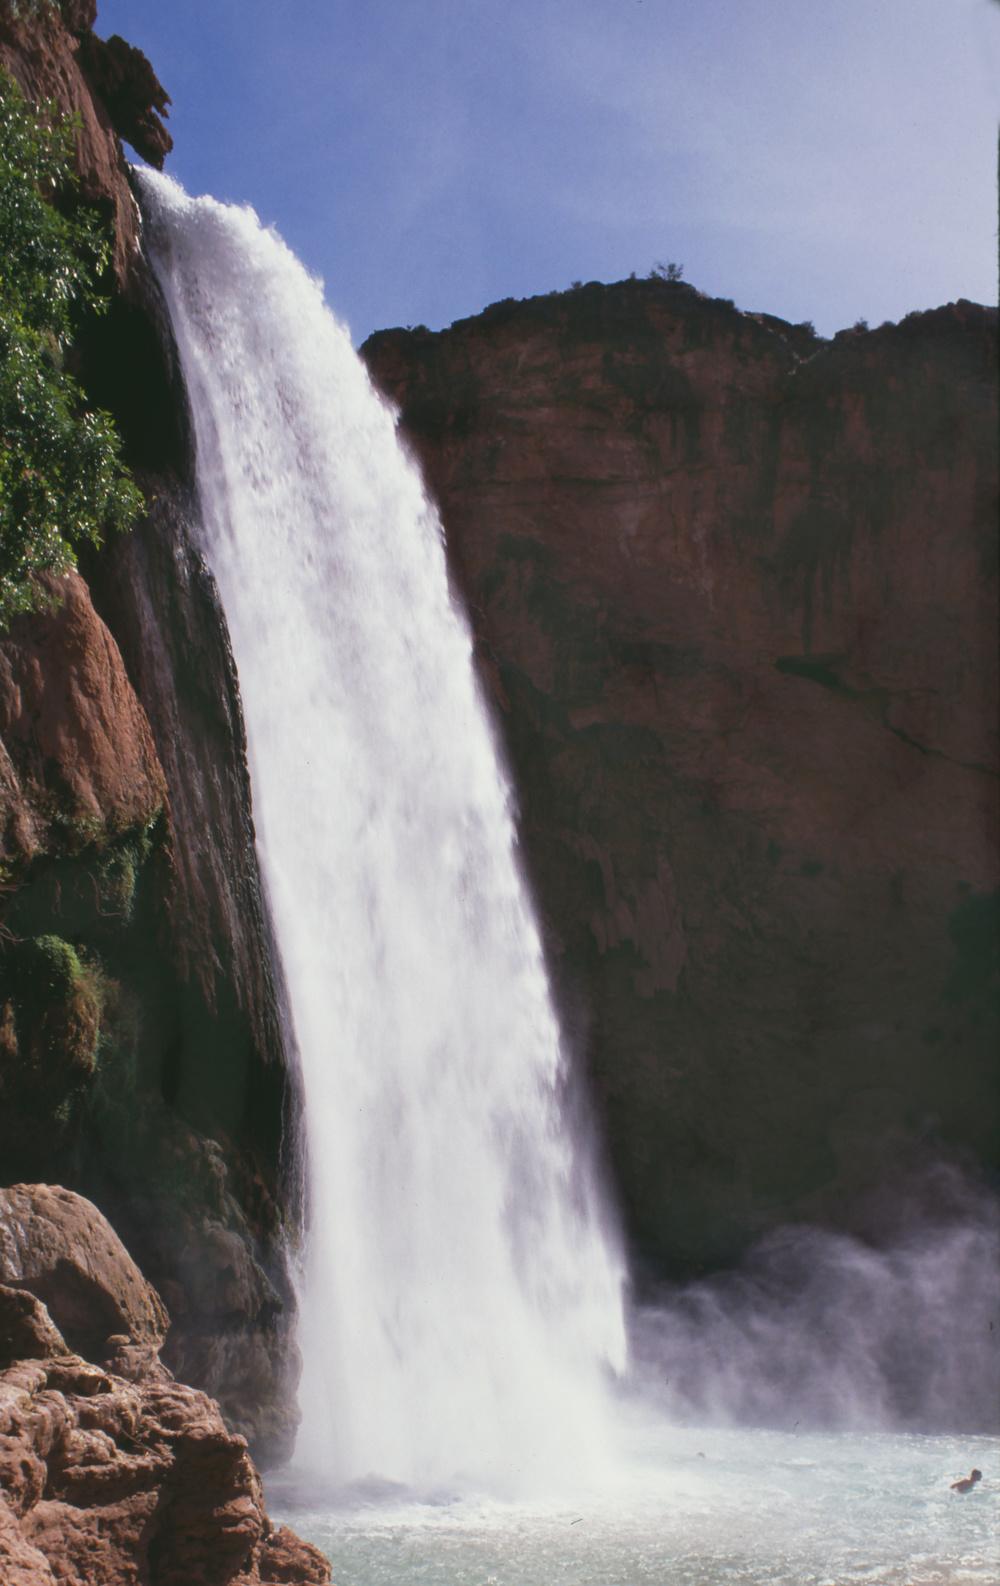 Havasu-falls-side-view-copy.jpg